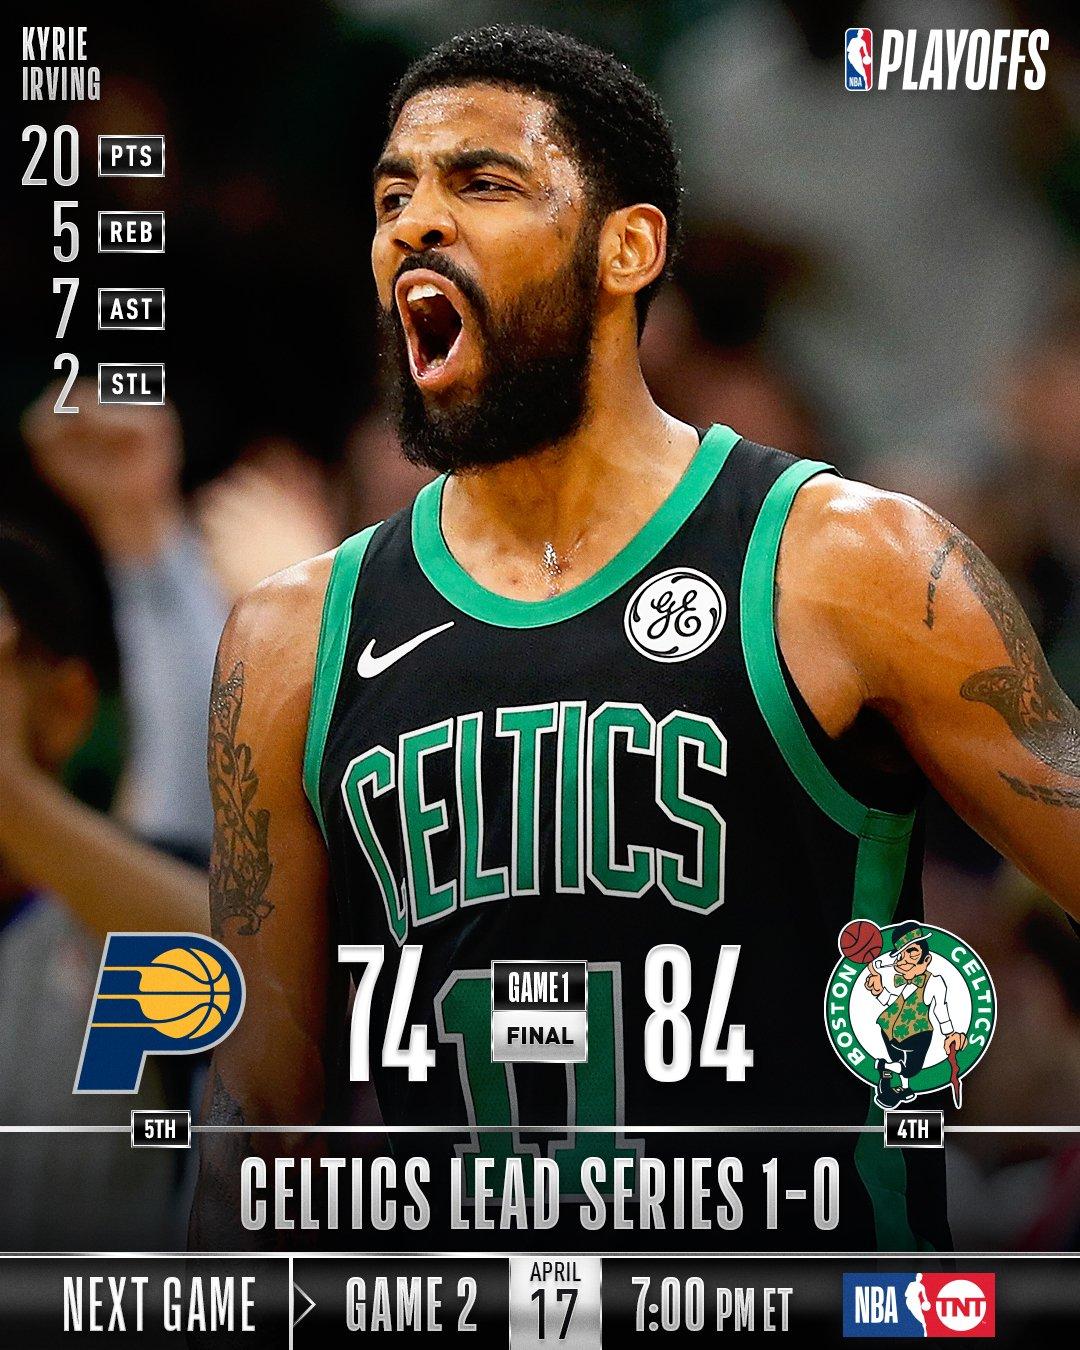 The @celtics win Game 1 in Boston!  Game 2: Wednesday (4/17), 7pm/et, TNT  #NBAPlayoffs https://t.co/ViNQj0zRQO